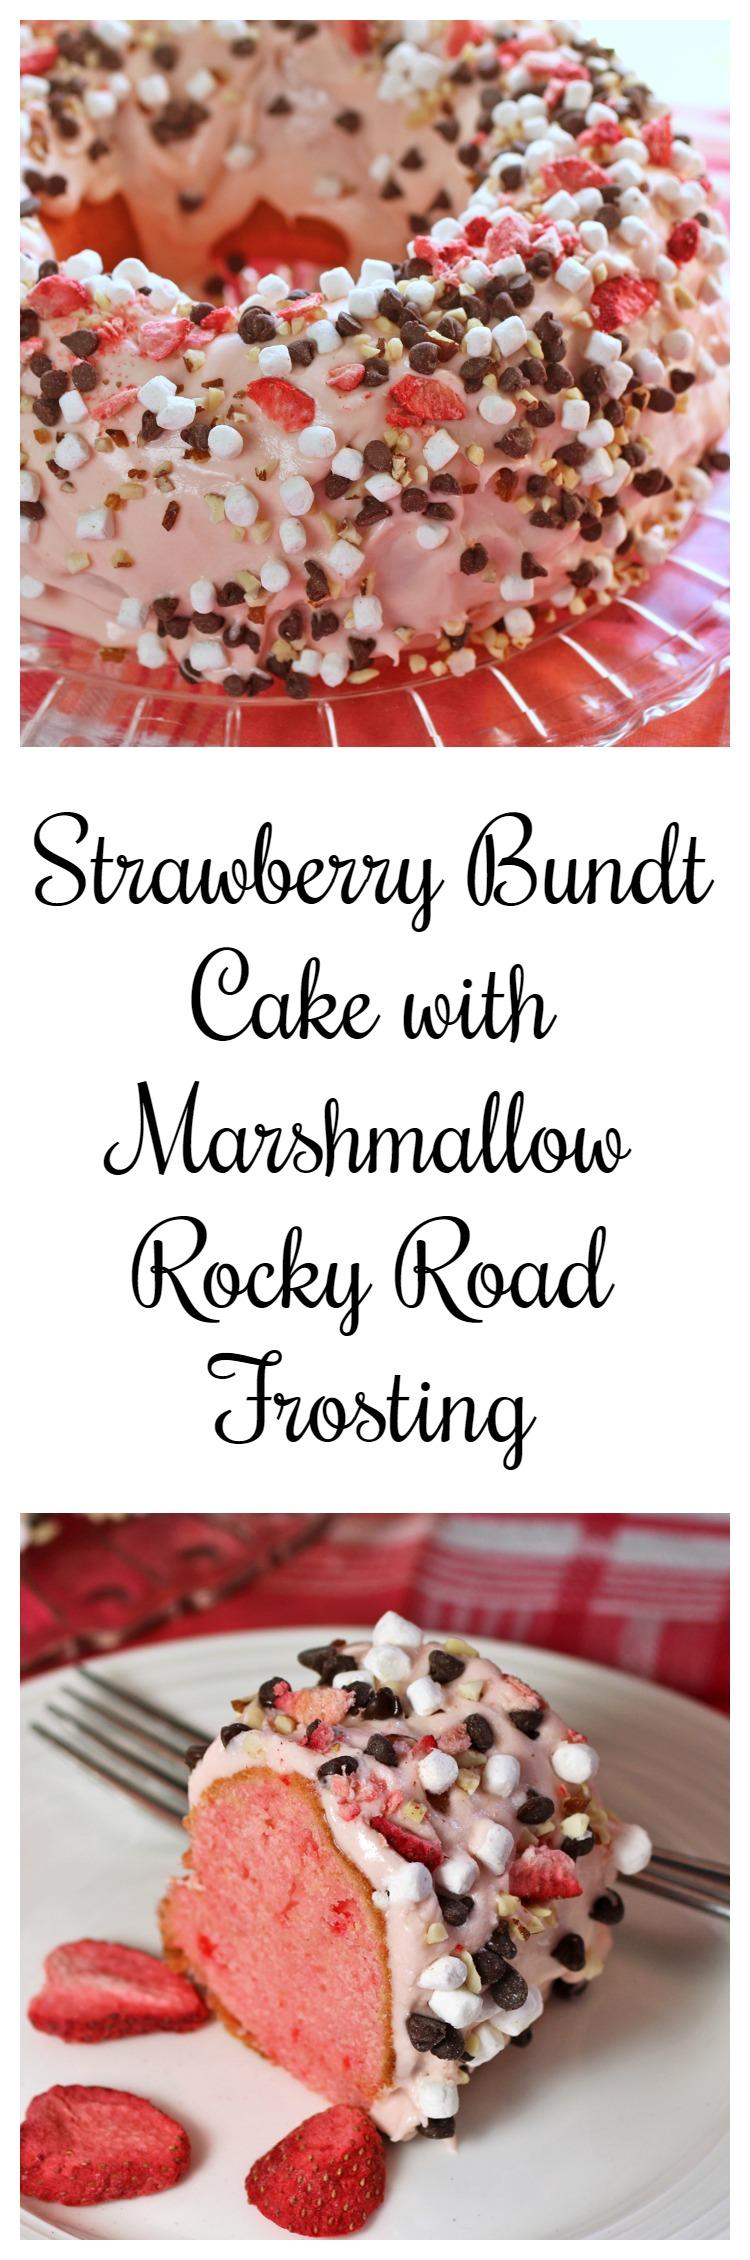 Strawberry Bundt Cake with Marshmallow Rocky Road Frosting